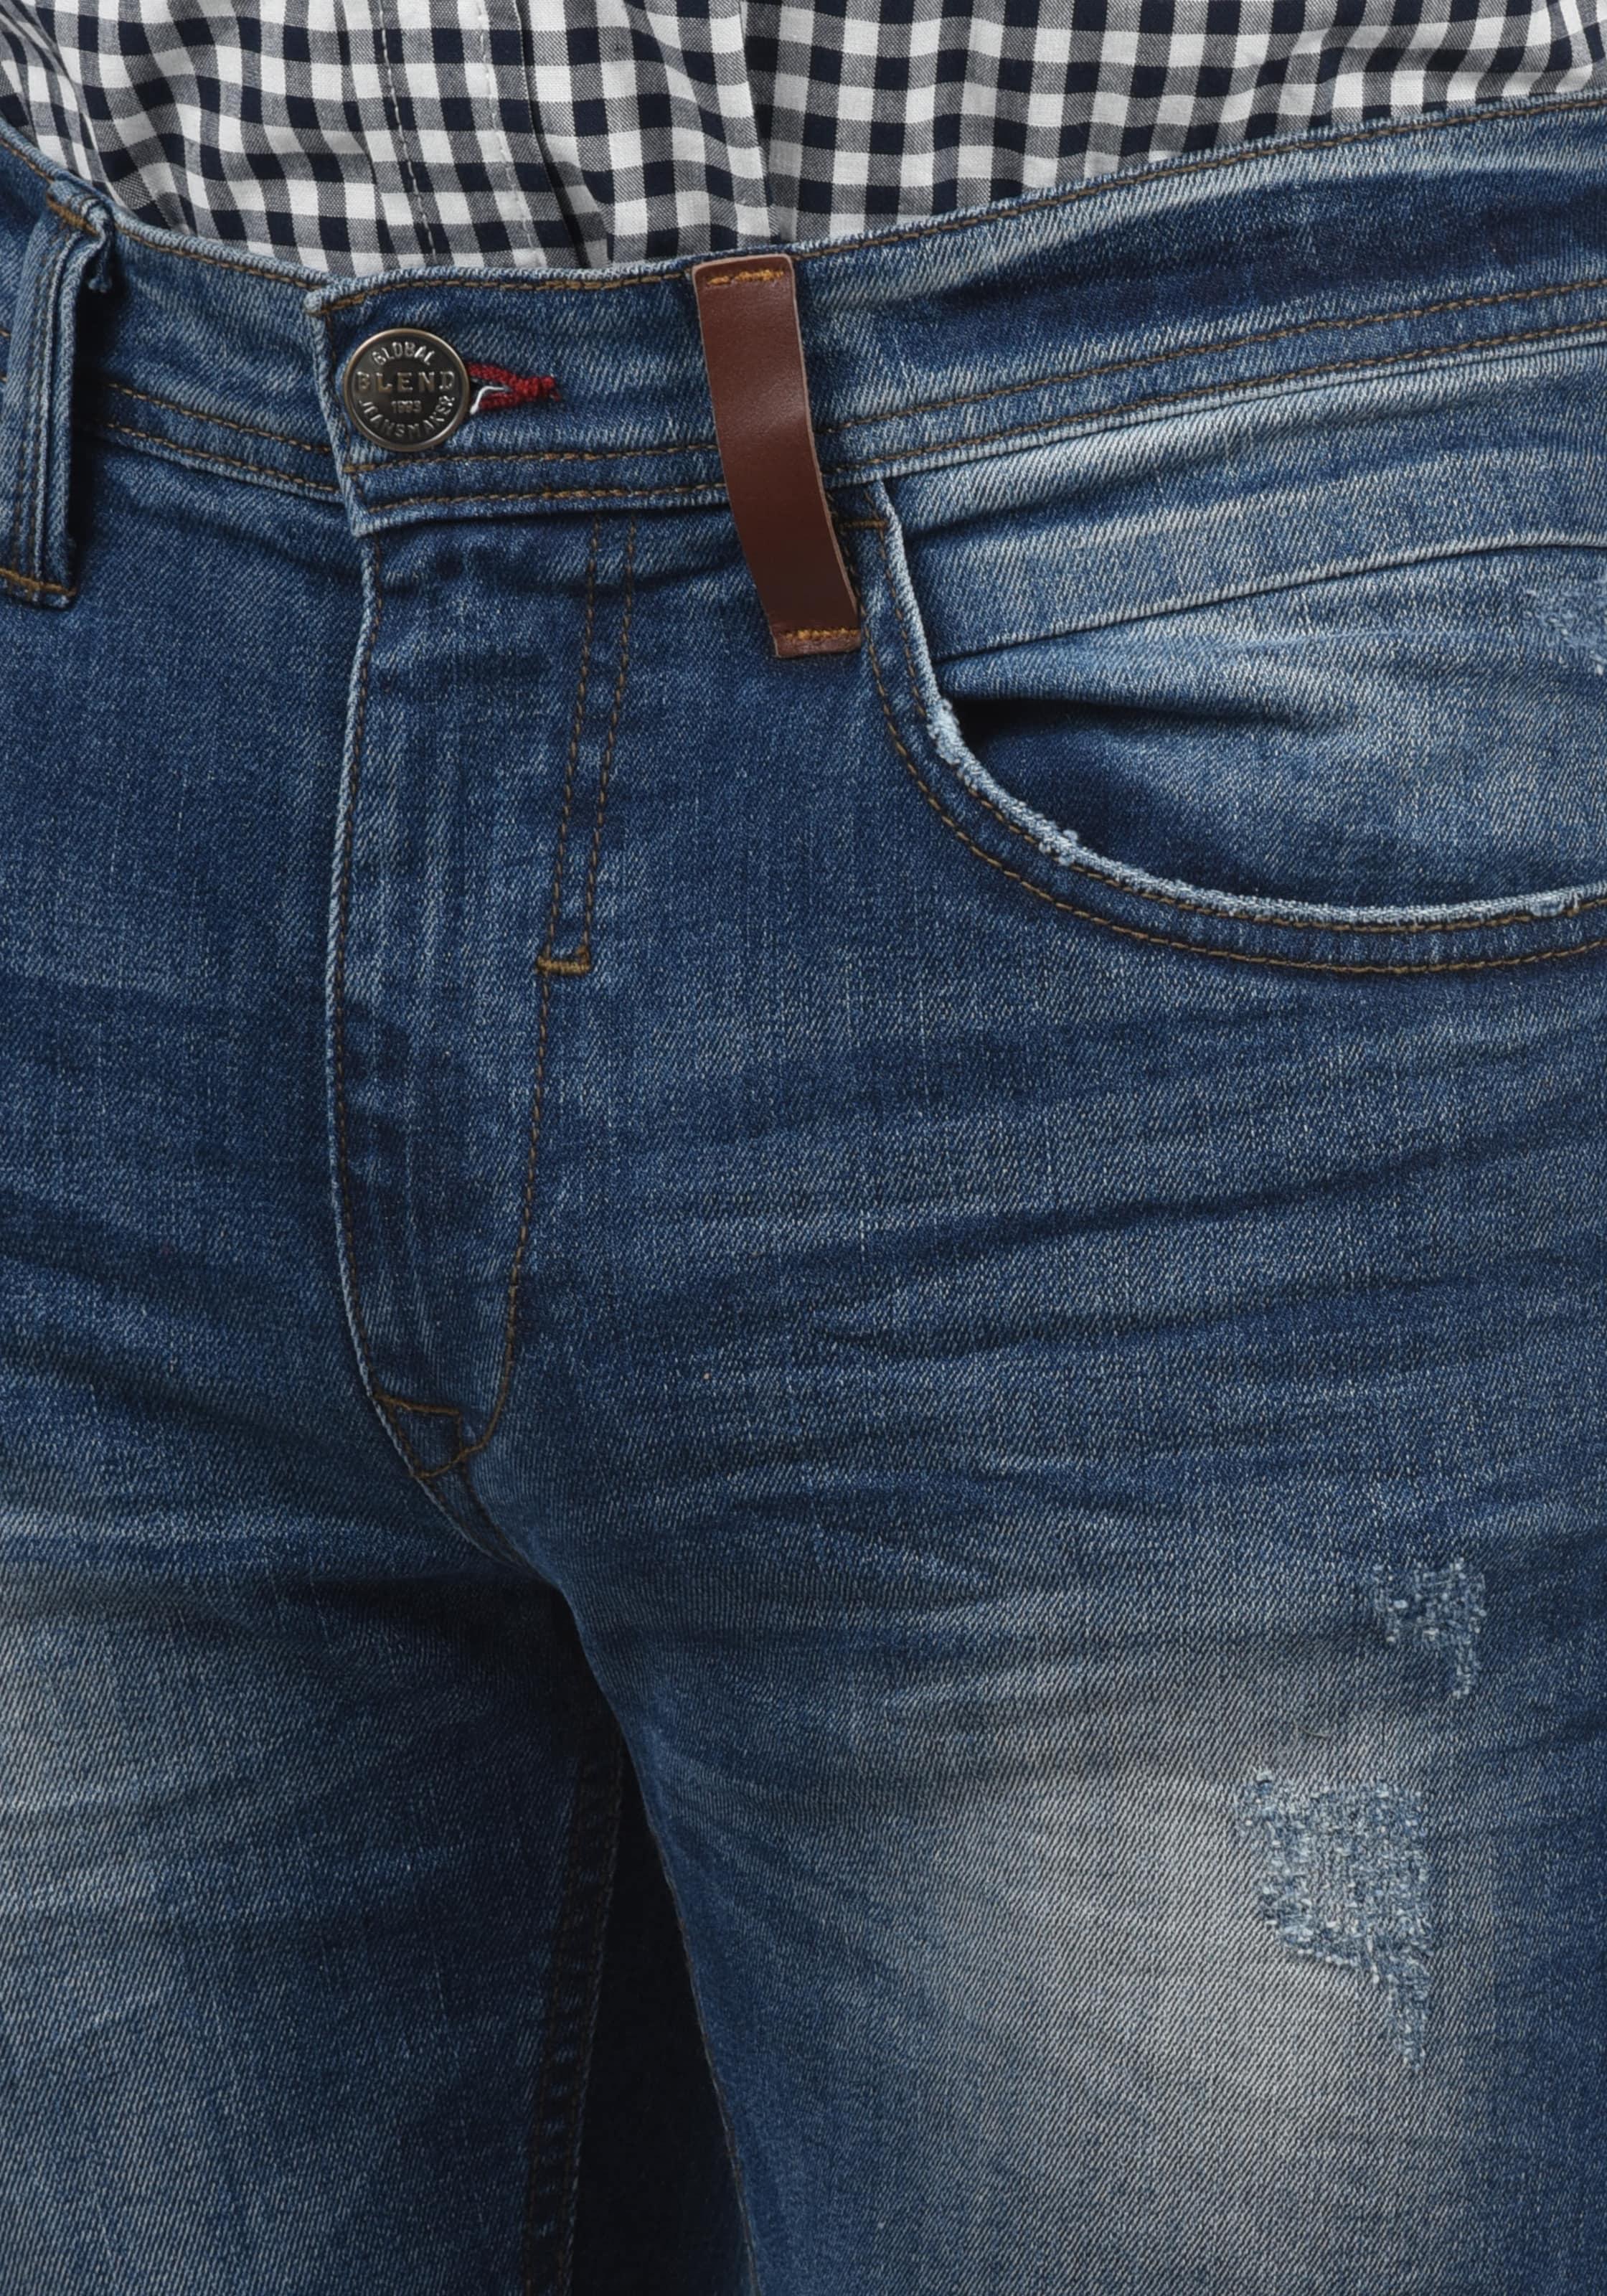 In 5 'husao' Blend pocket jeans Blau xQrCBodeW